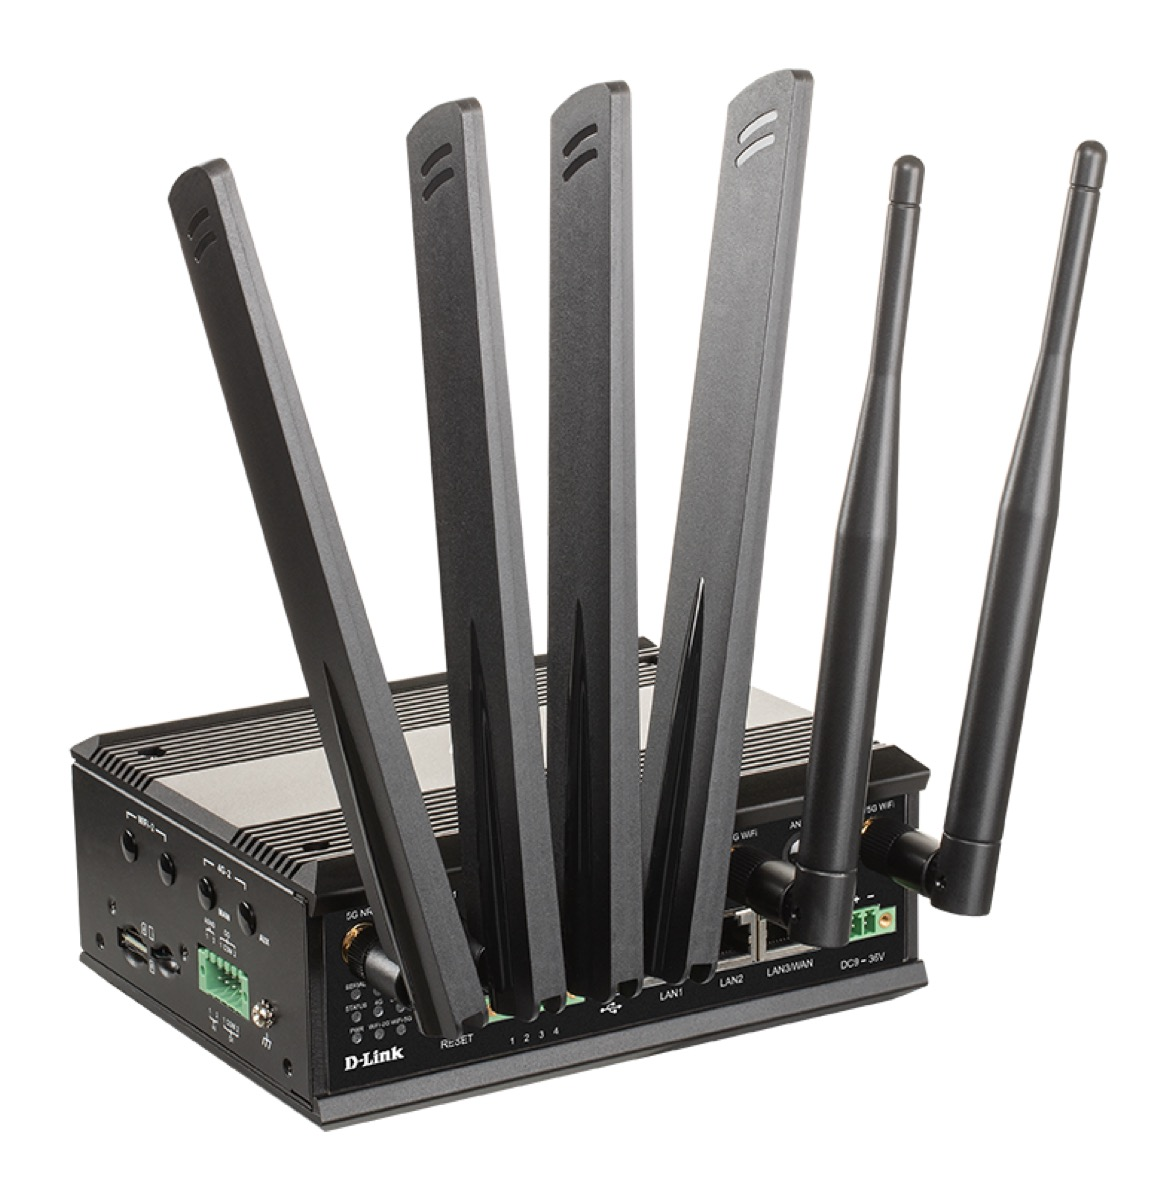 Al MWC 21 arriva la nuova era del networking D-Link